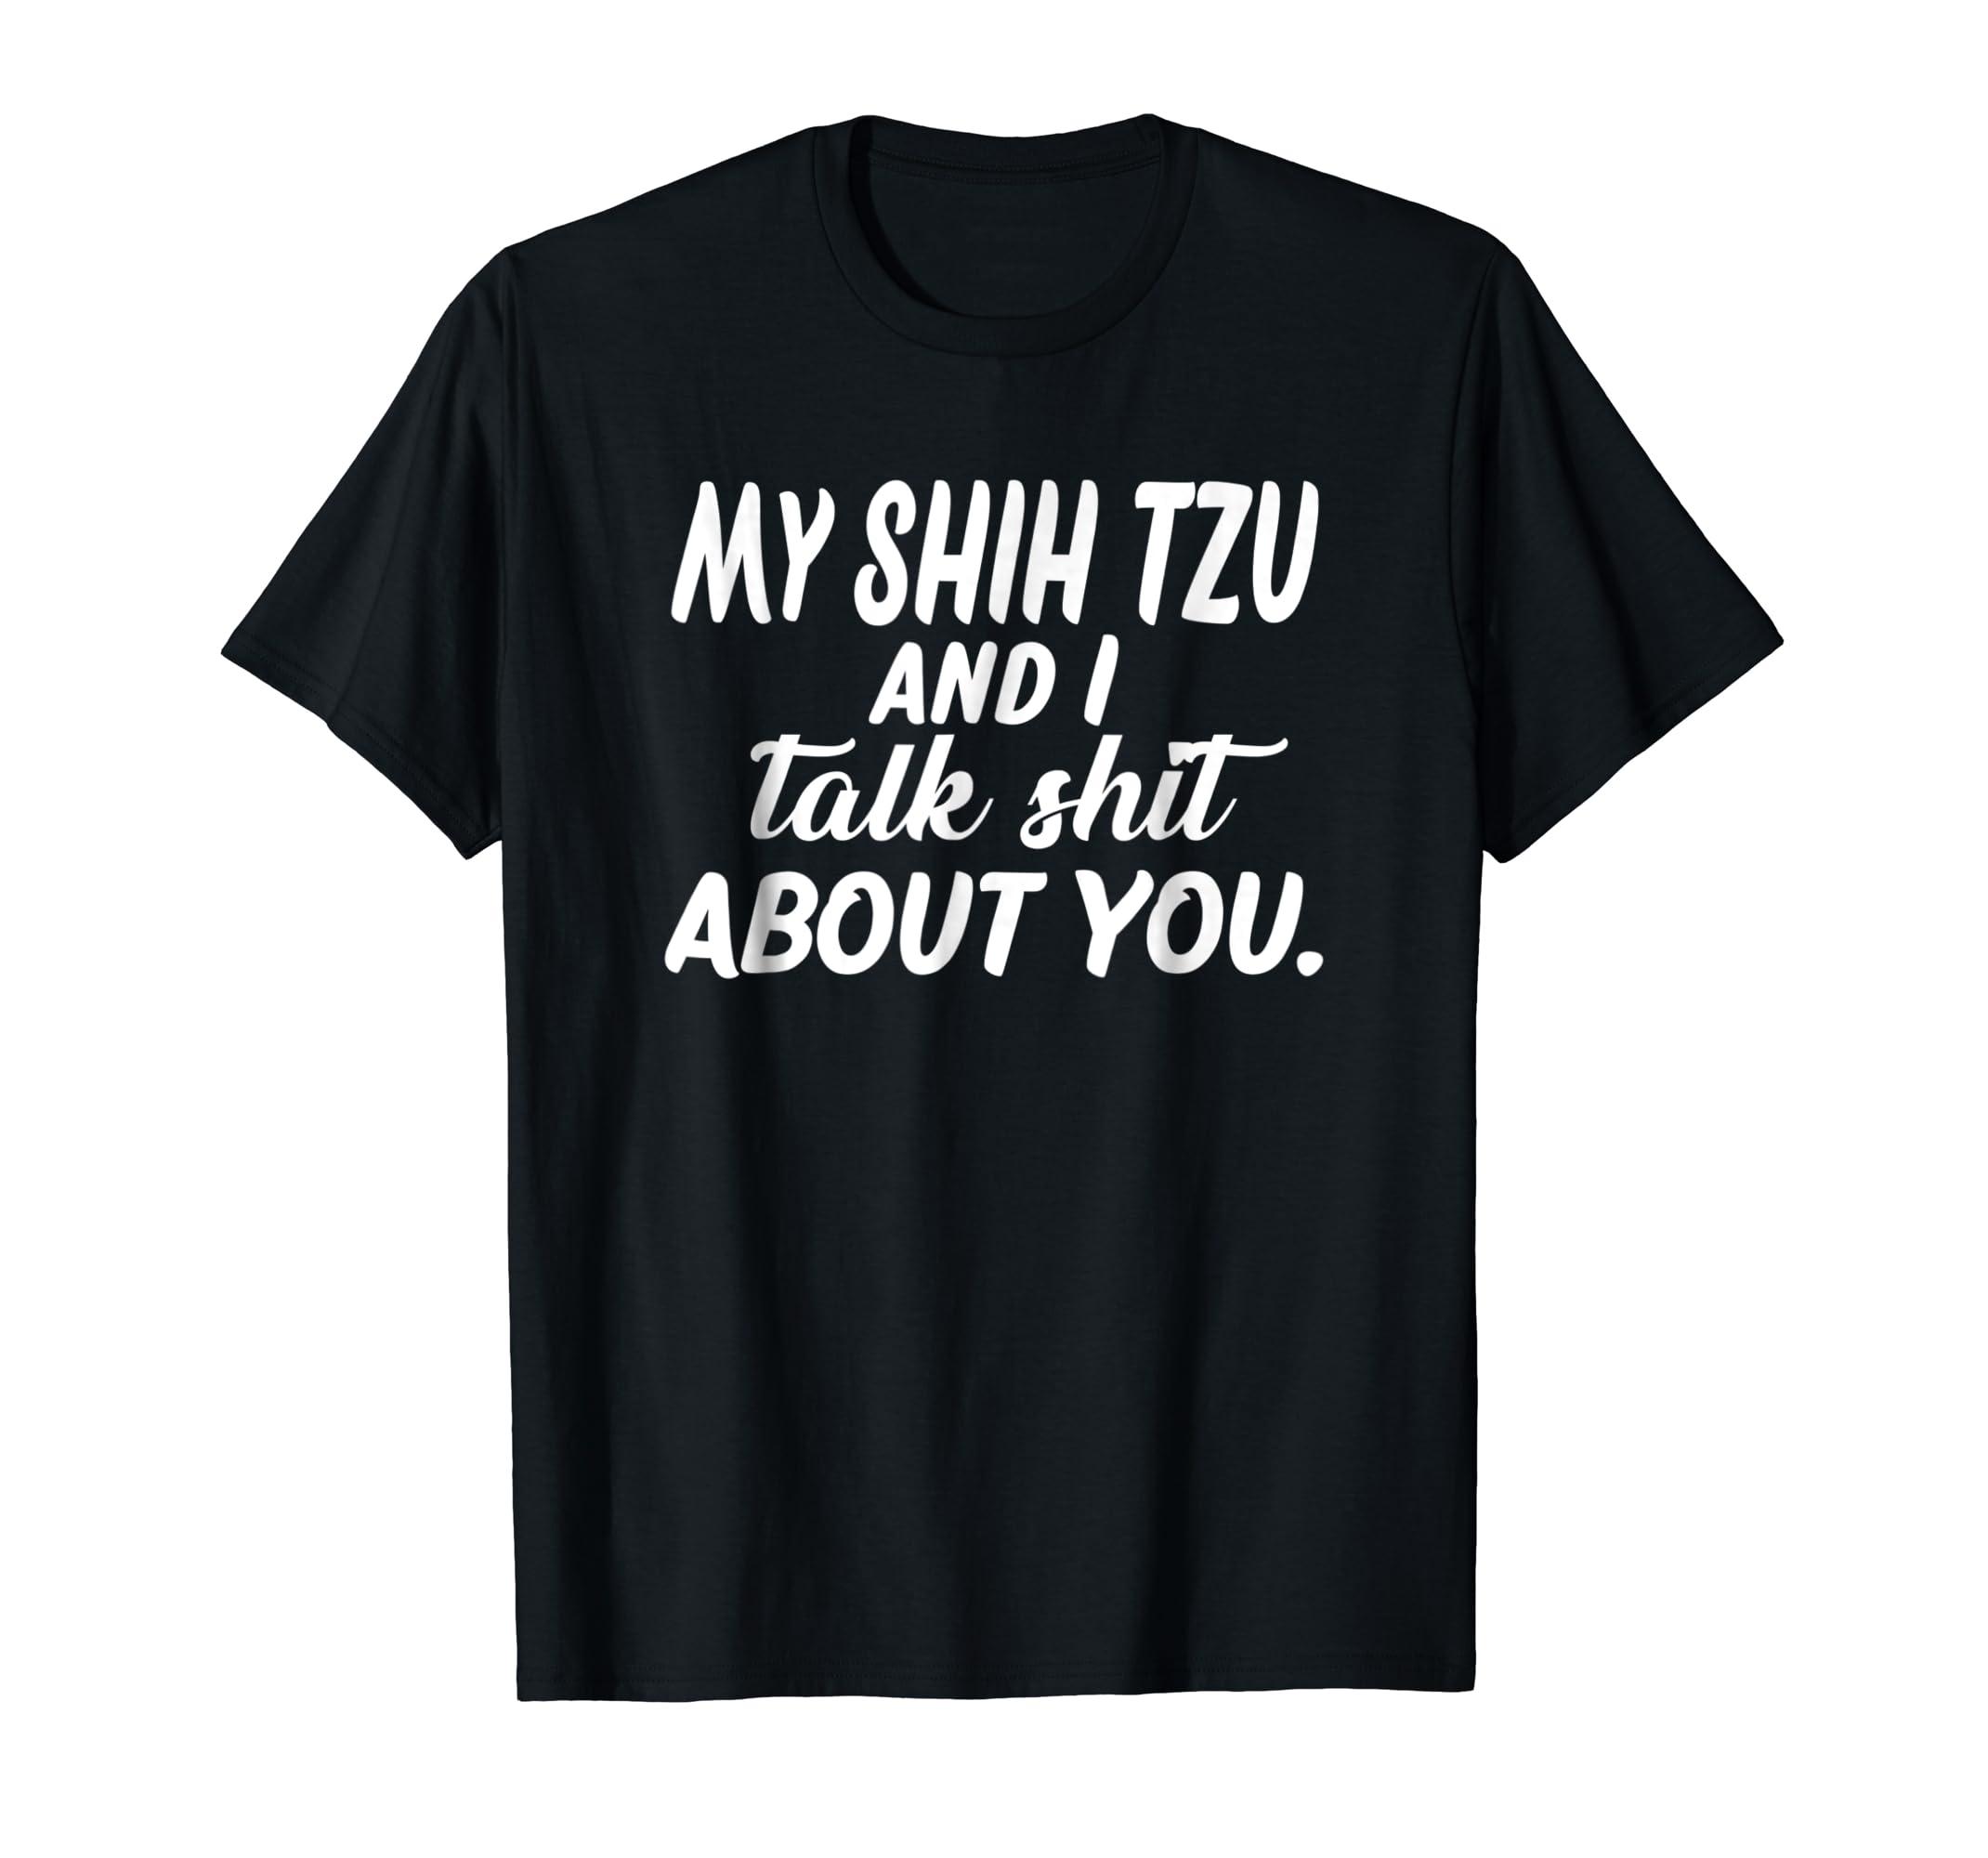 My Shih Tzu And I Talk Shit About You Shirt-Men's T-Shirt-Black